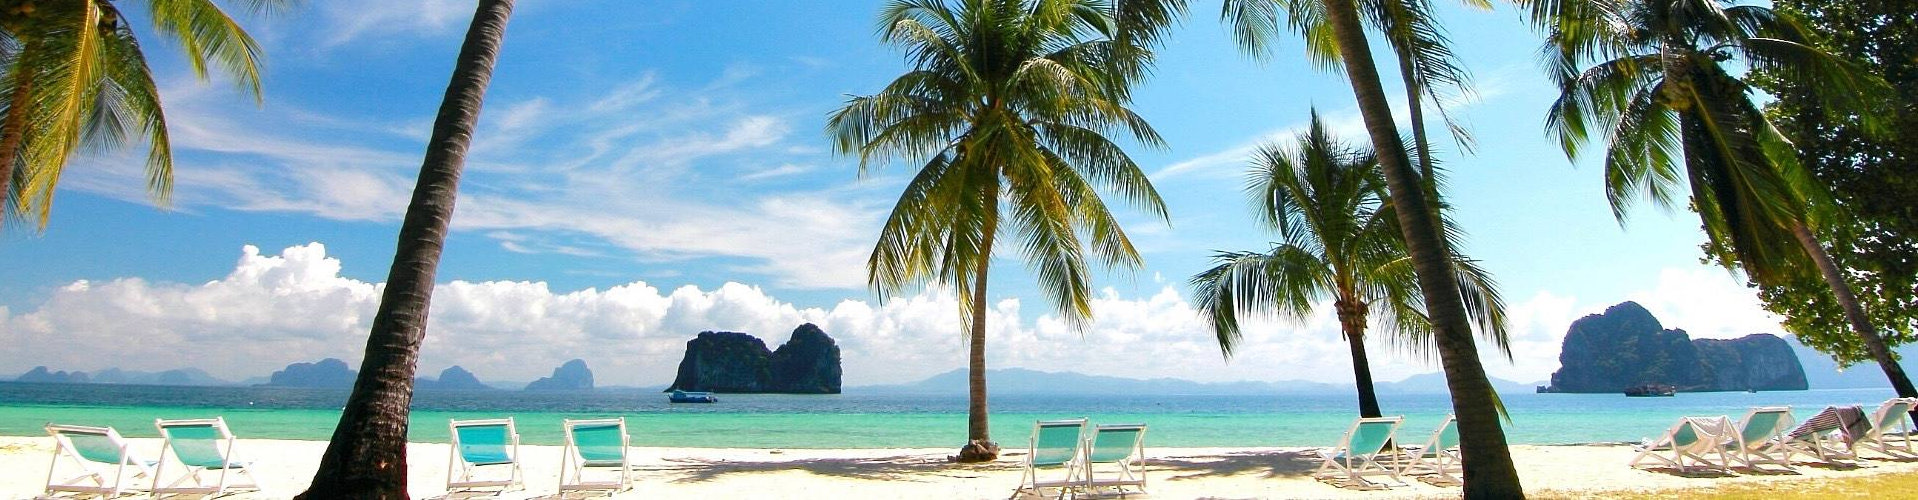 agence voyages thailande